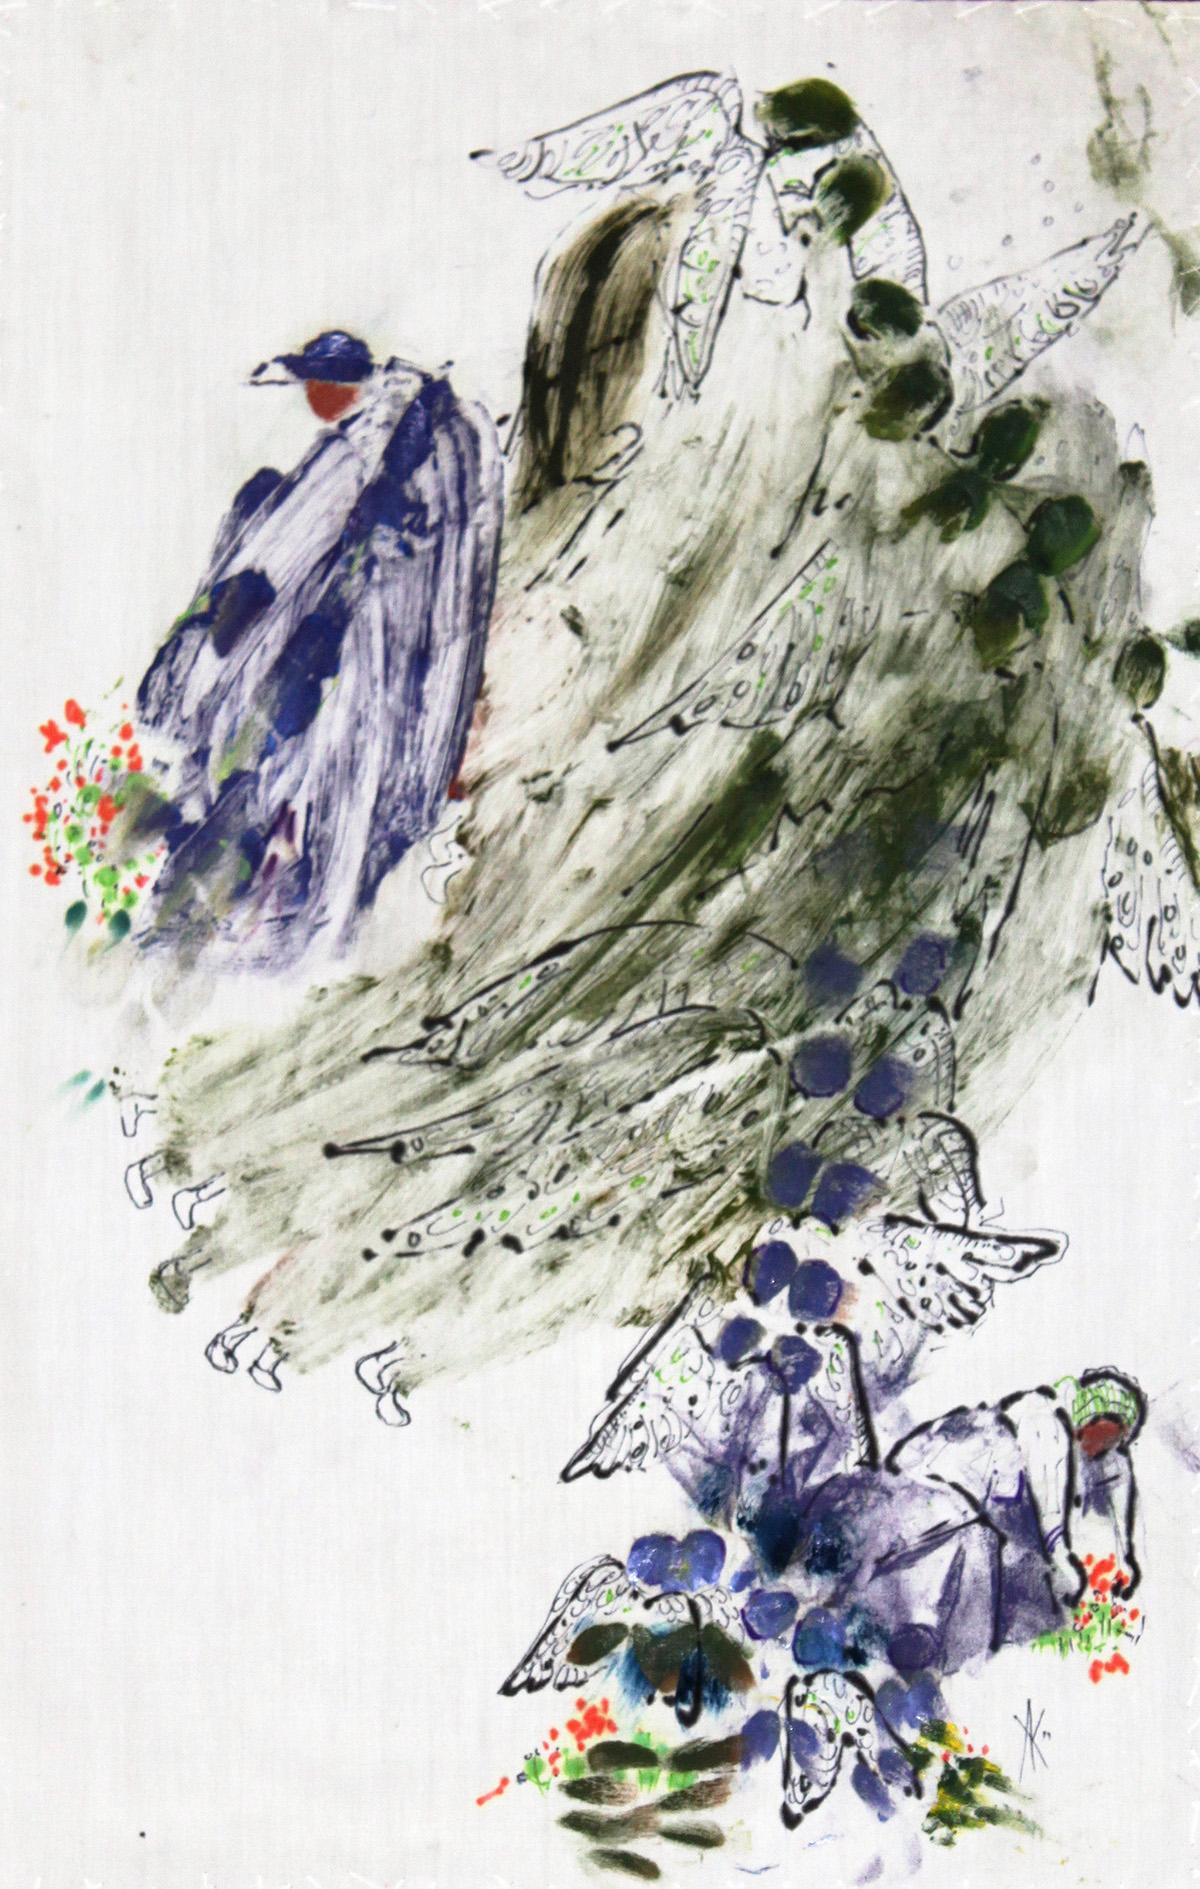 TITLE:  Angels garden  MEDIUM: Mixed media on cotton DIMENSIONS: H43 x W27cm  FRAMED